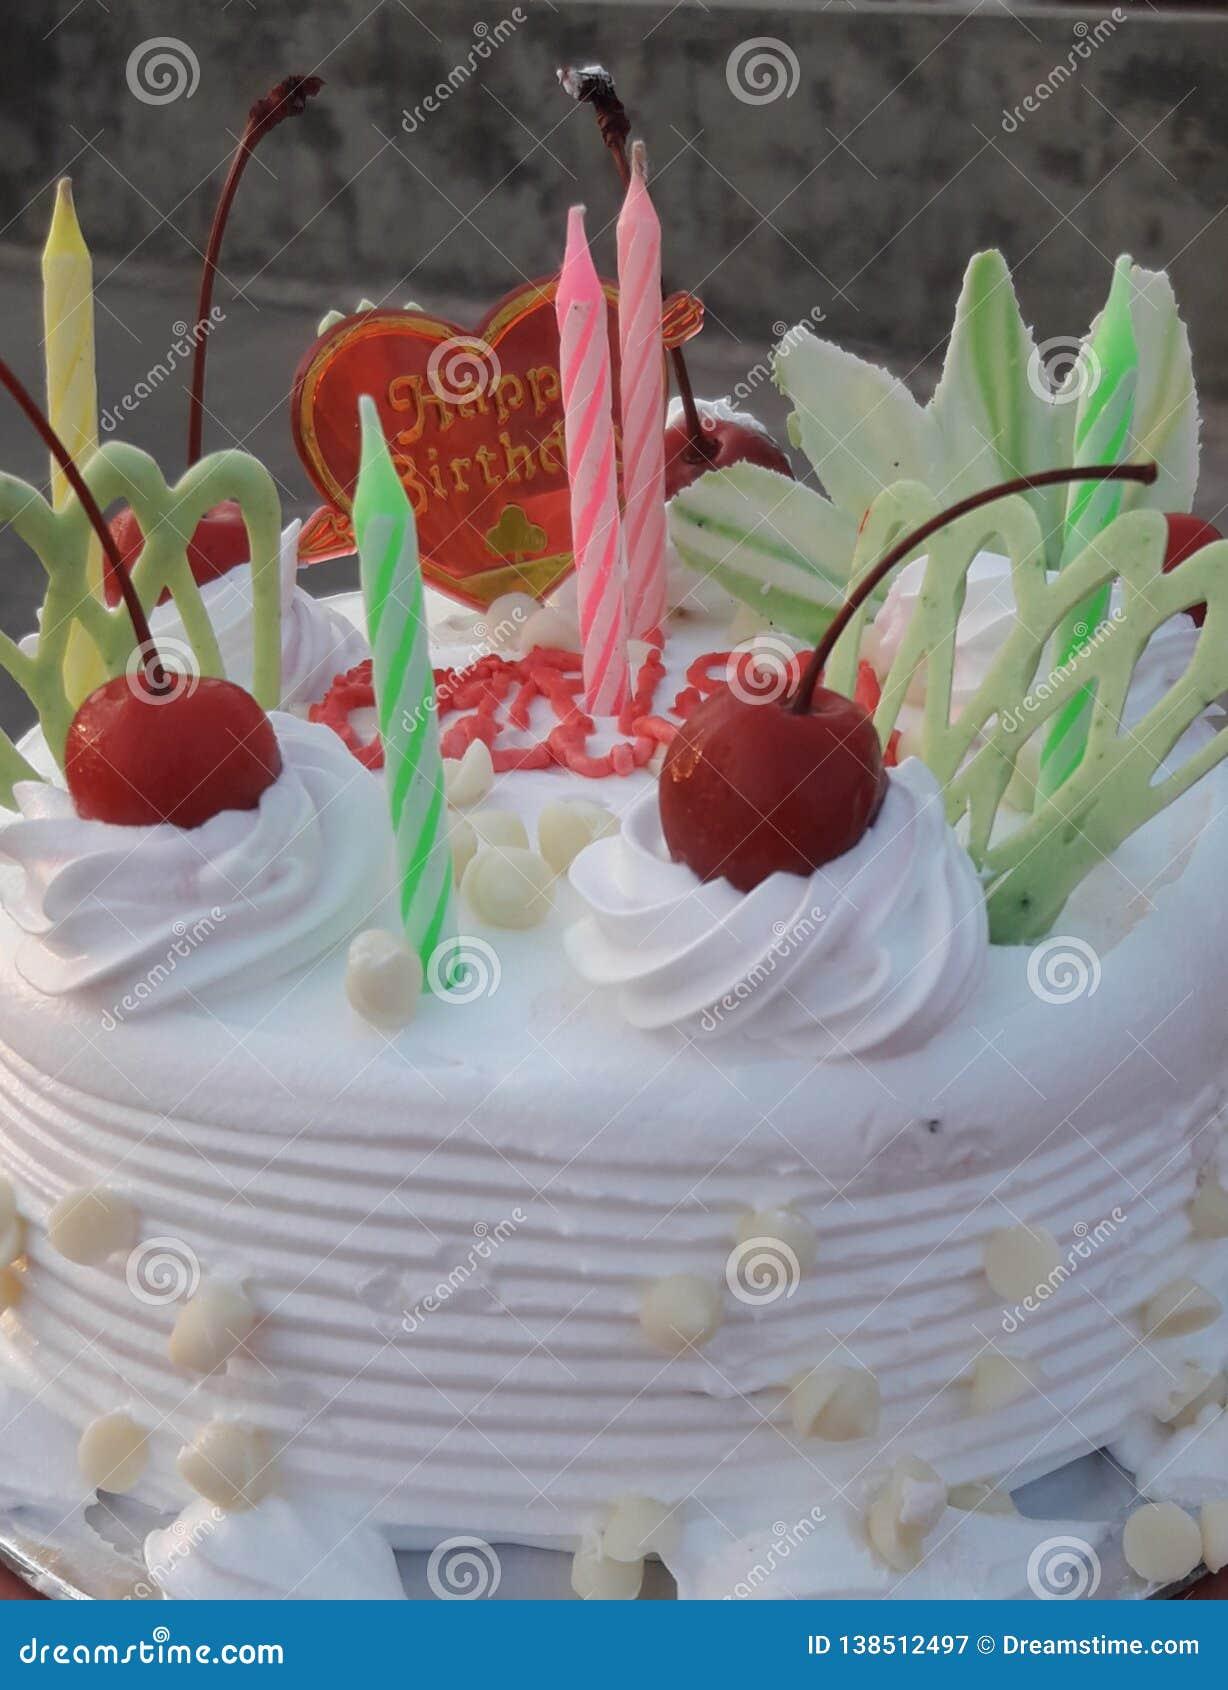 Fantastic Birthday Cake Stock Image Image Of Nice Special Very 138512497 Personalised Birthday Cards Petedlily Jamesorg